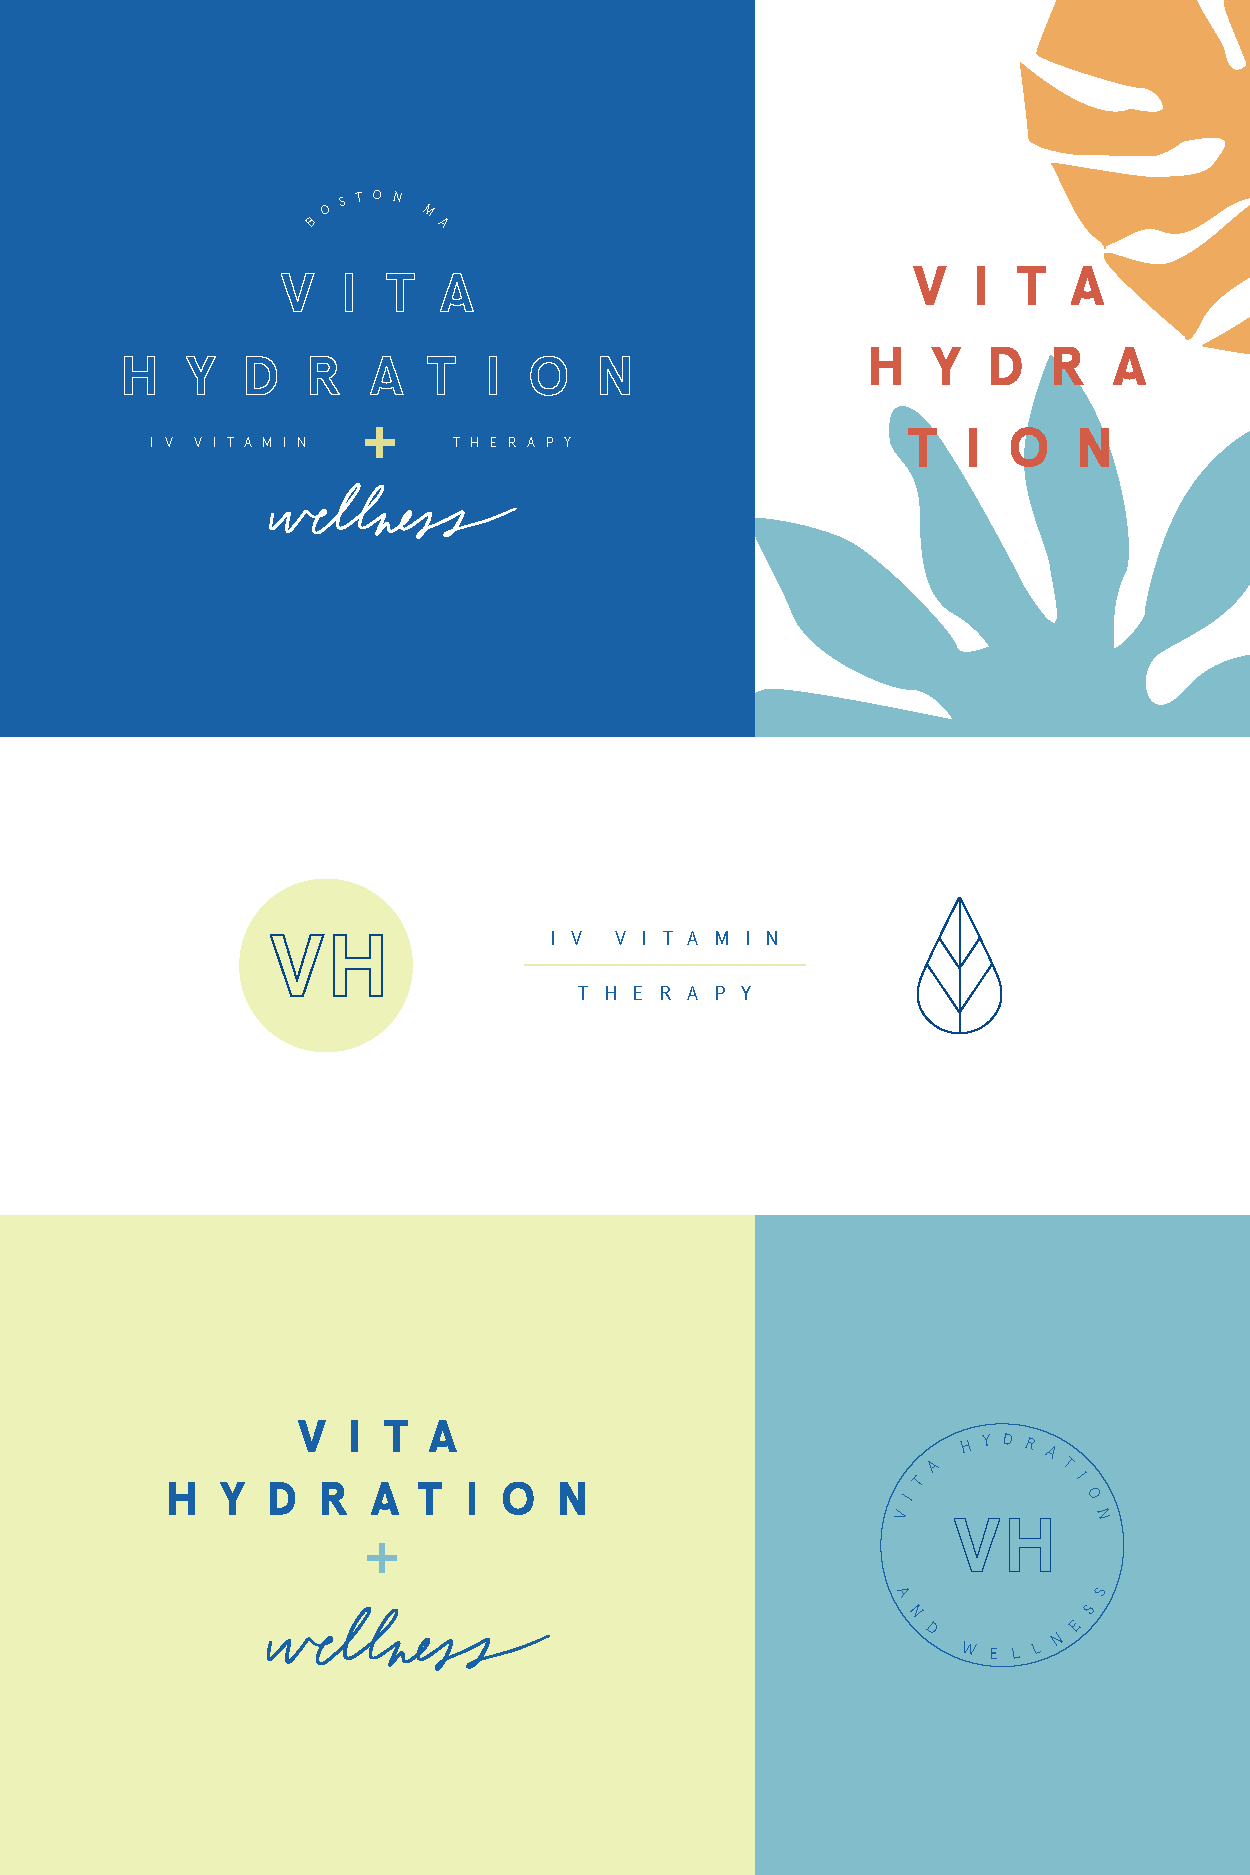 Vitahydration-brand2.png